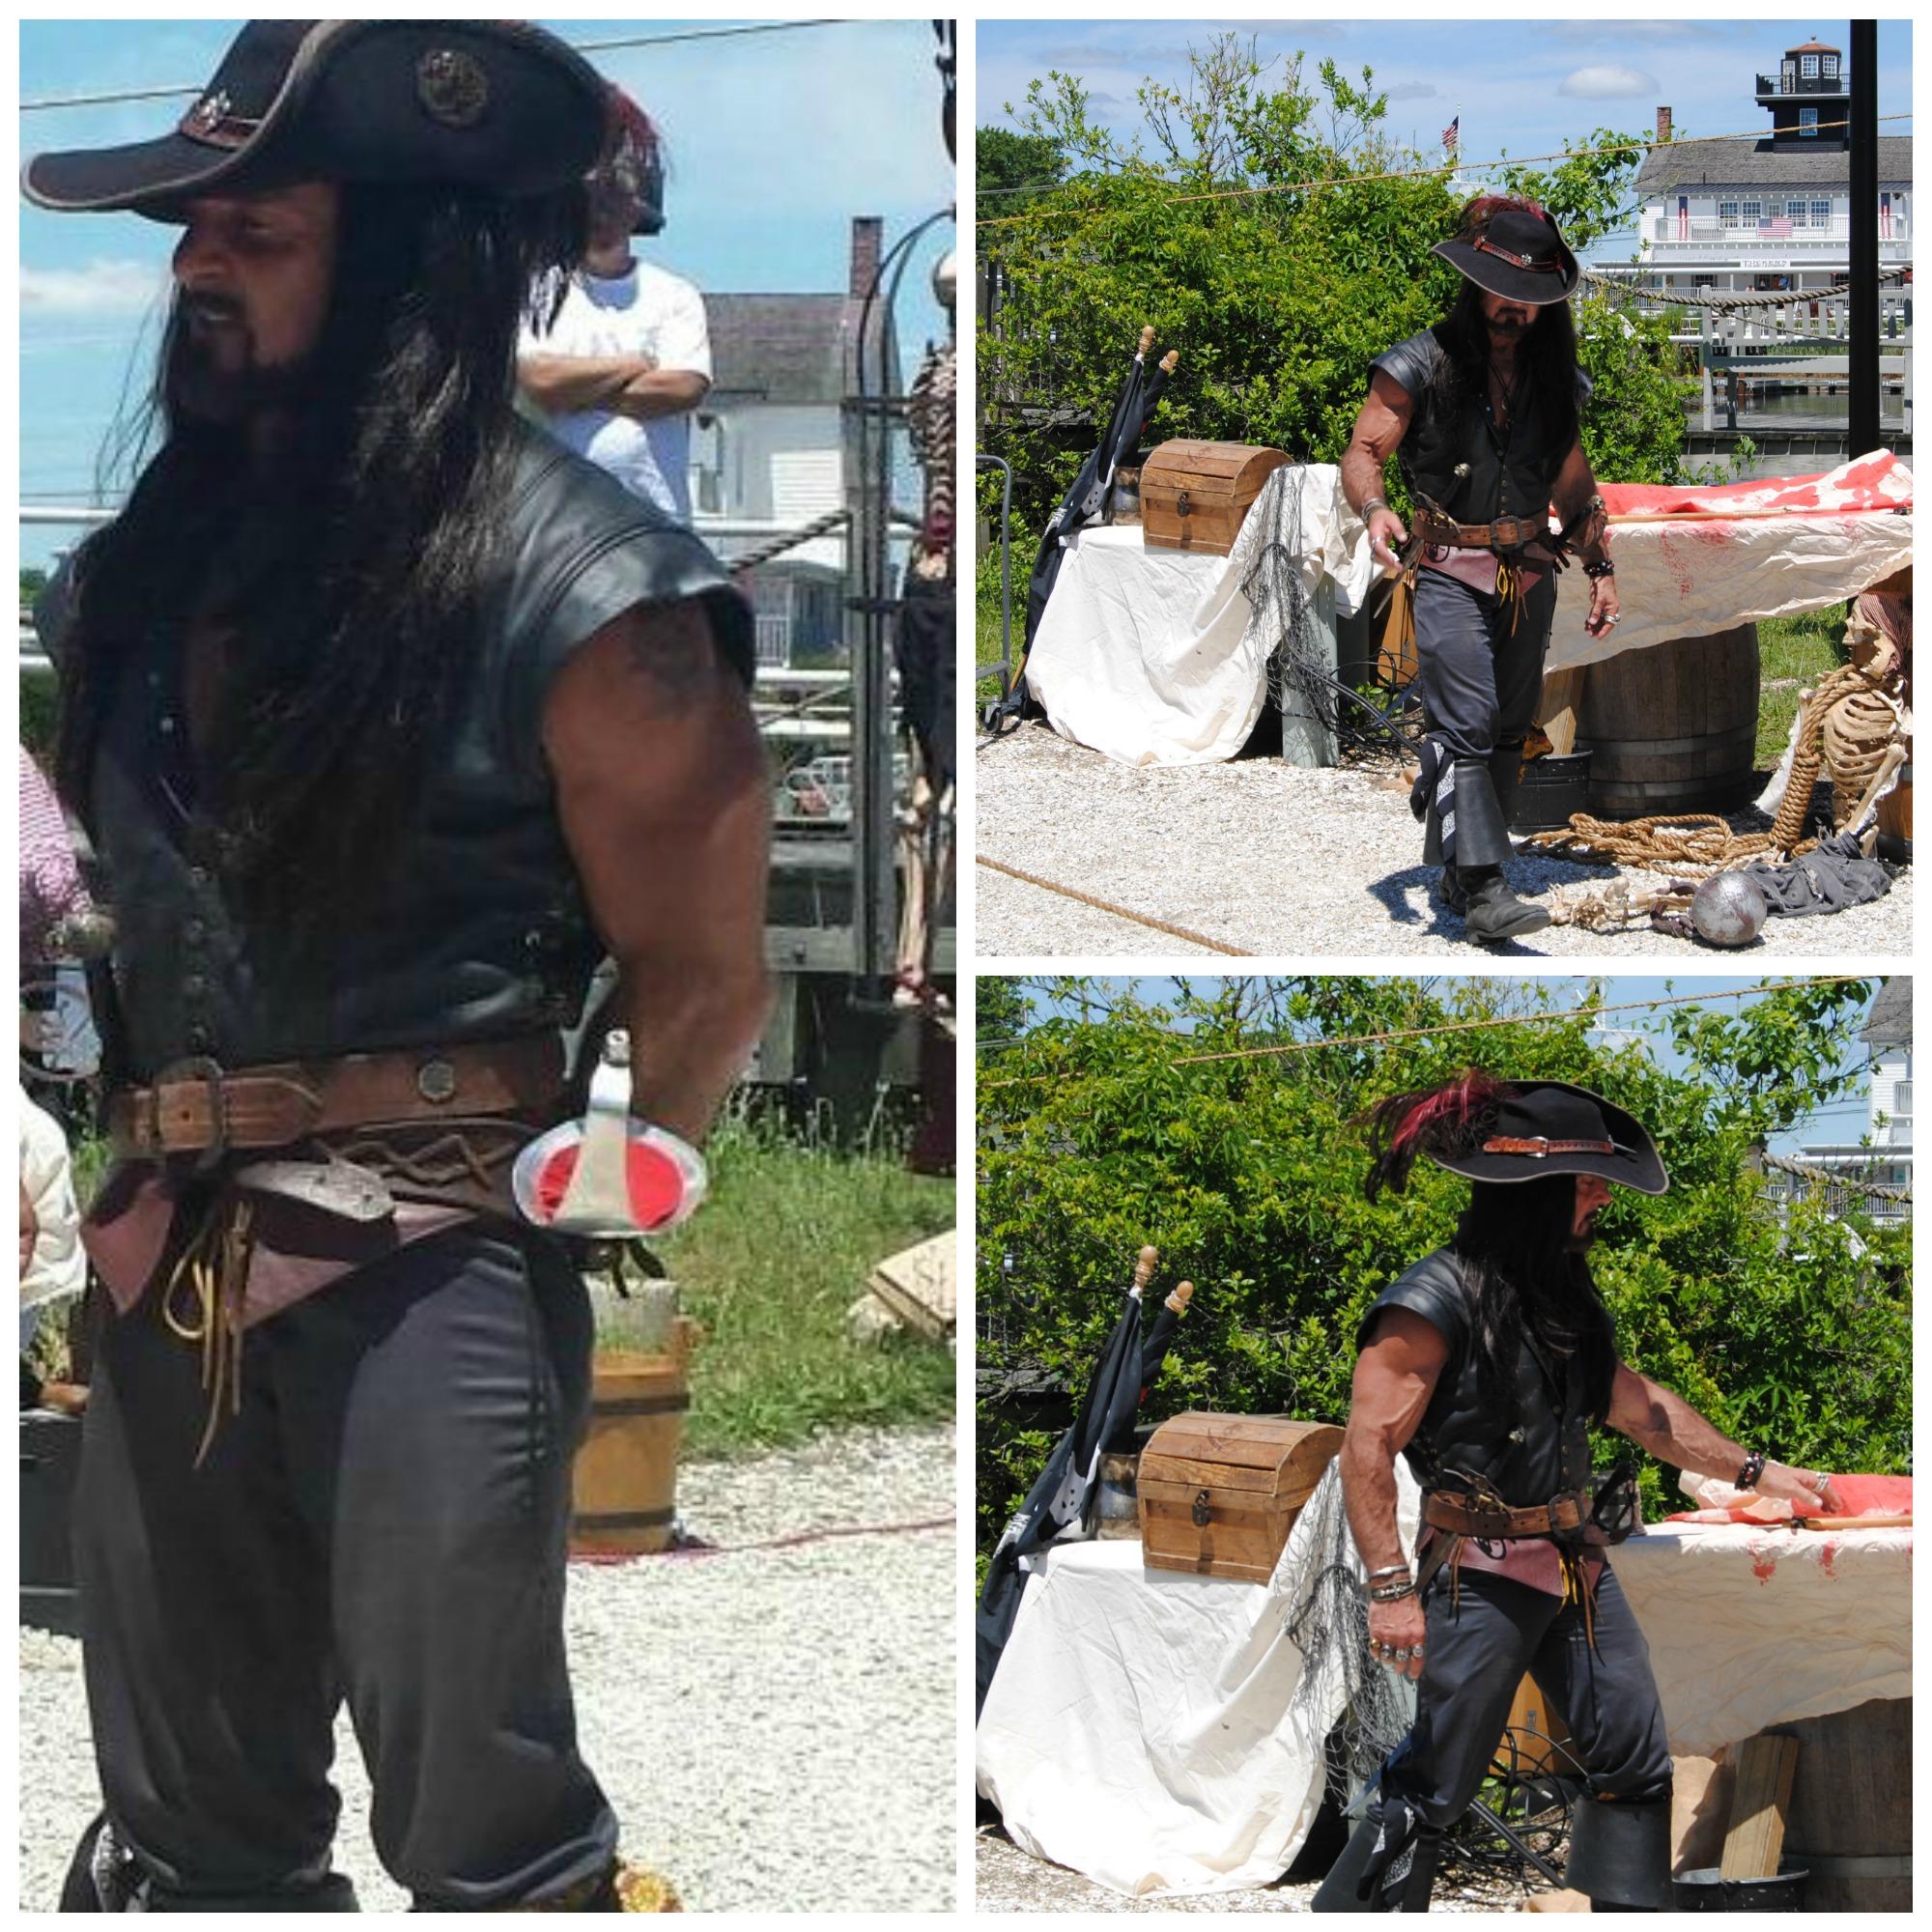 Tuckerton Seaport captain black